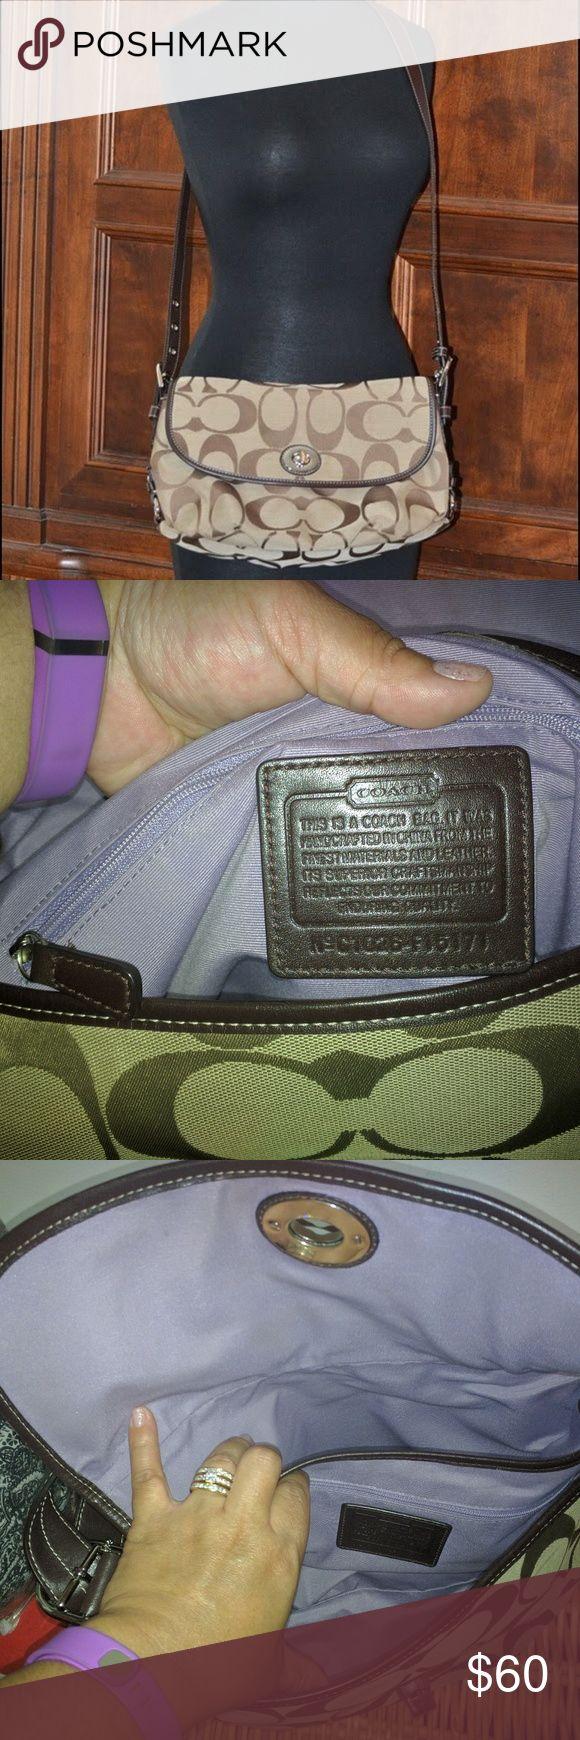 Coach Bag Coach Duffle Bag.  Can wear as a cross body or shoulder bag. Excellent condition! pet/smoke free home Coach Bags Crossbody Bags